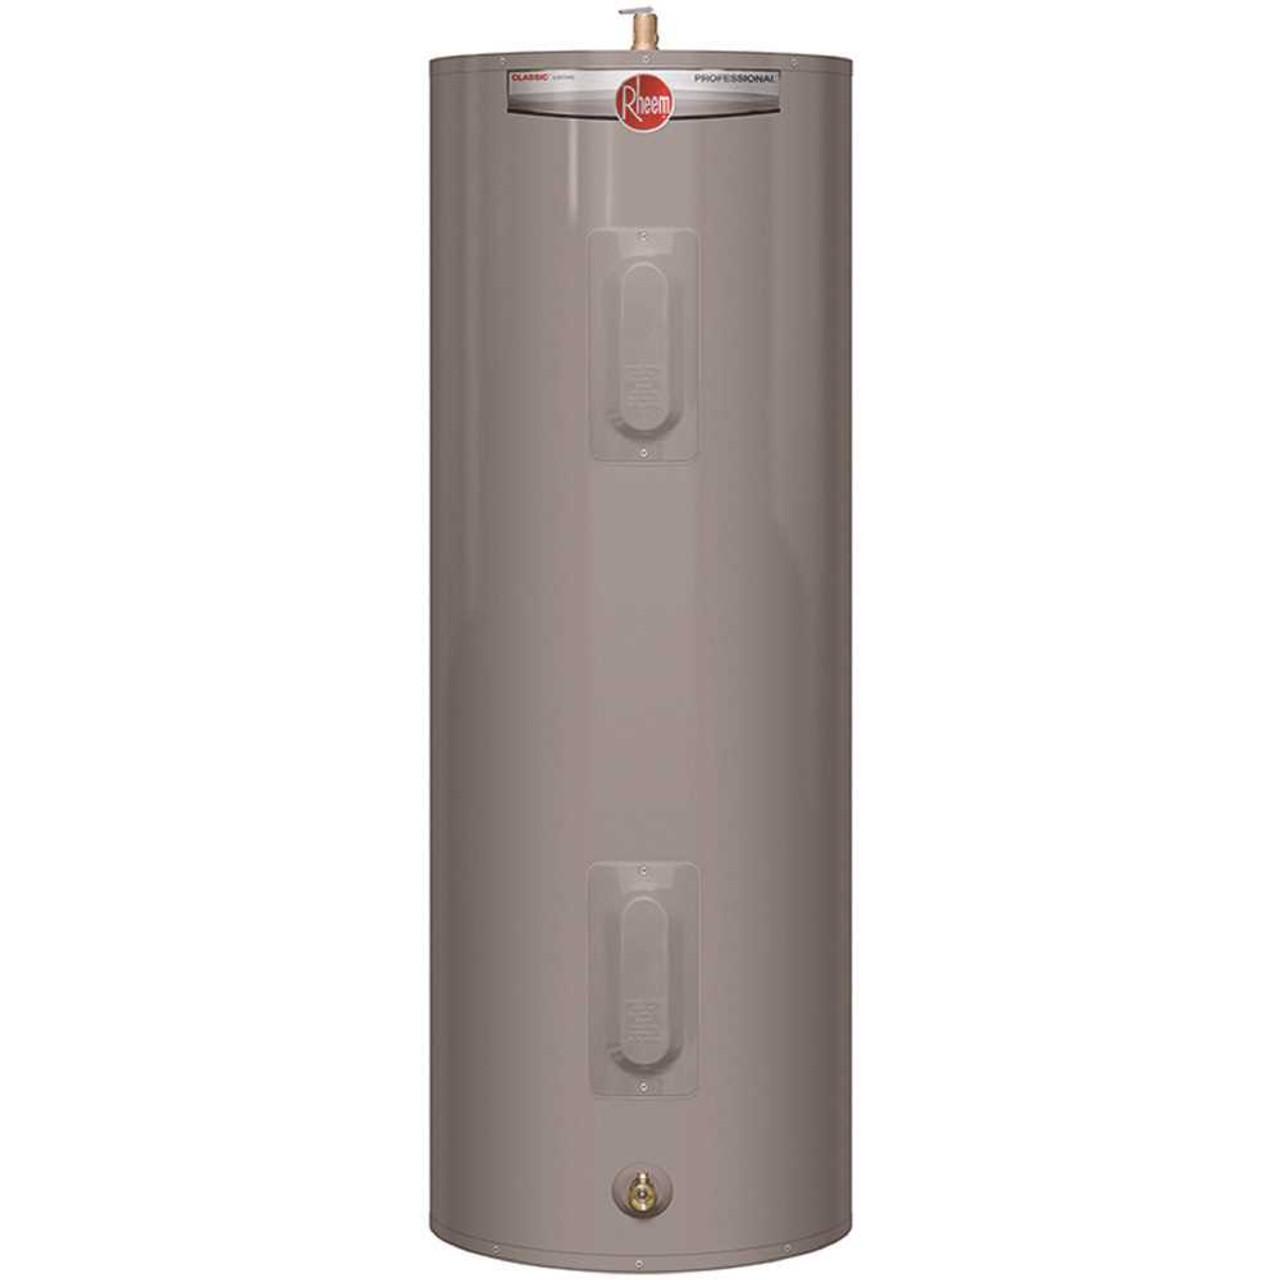 Rheem Professional Classic 40 Gal. Medium 6 Year 240-VAC 4500-Watt Electric Water Heater - Item # 2487237, Rheem Part # PROE40 M2 RH95, UPC Code 020352650265